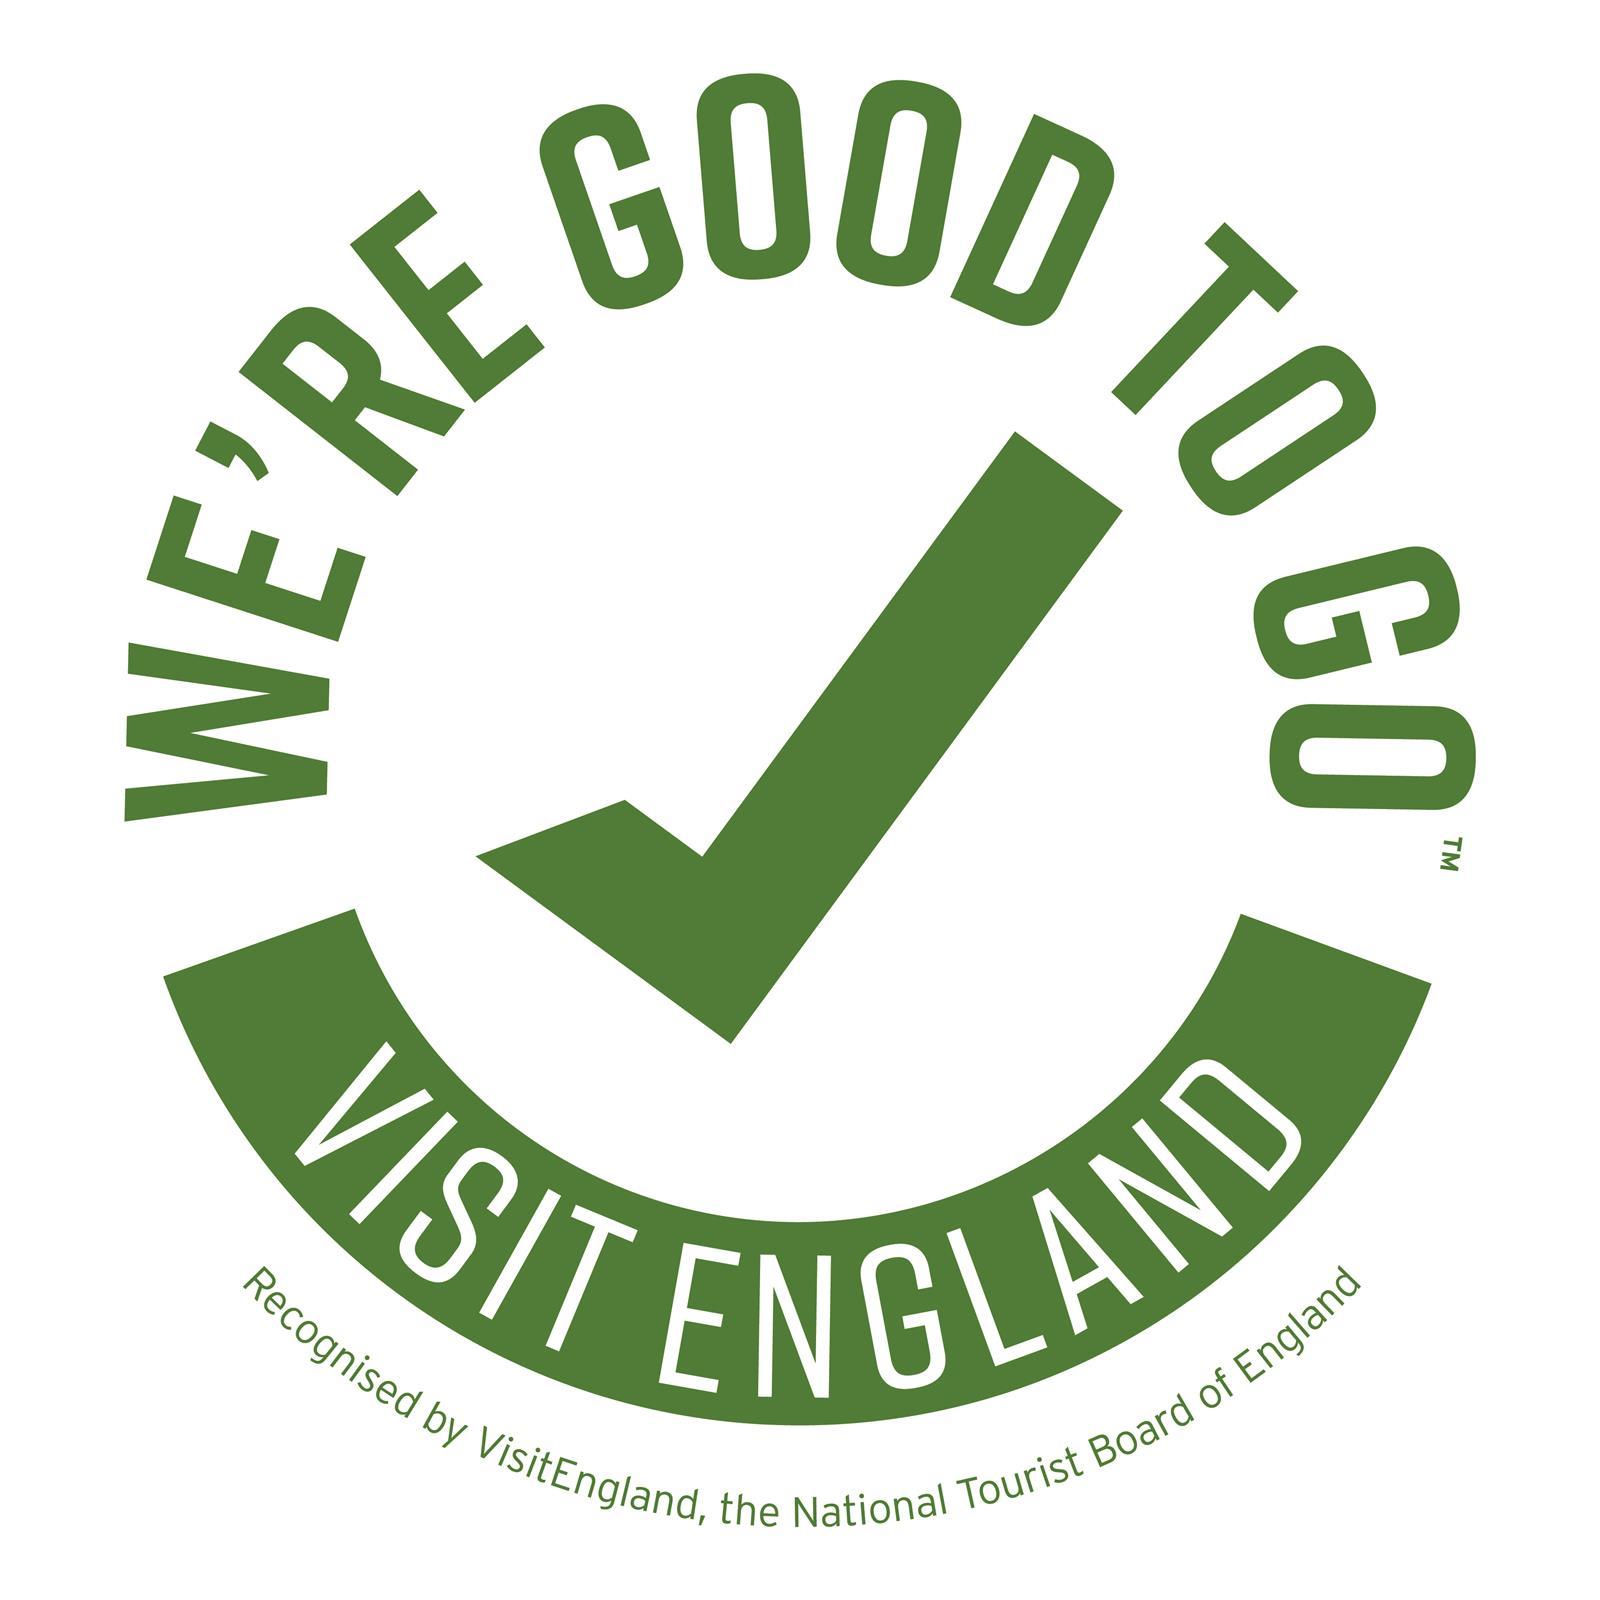 VisitEngland We're Good to Go Accreditation Scheme